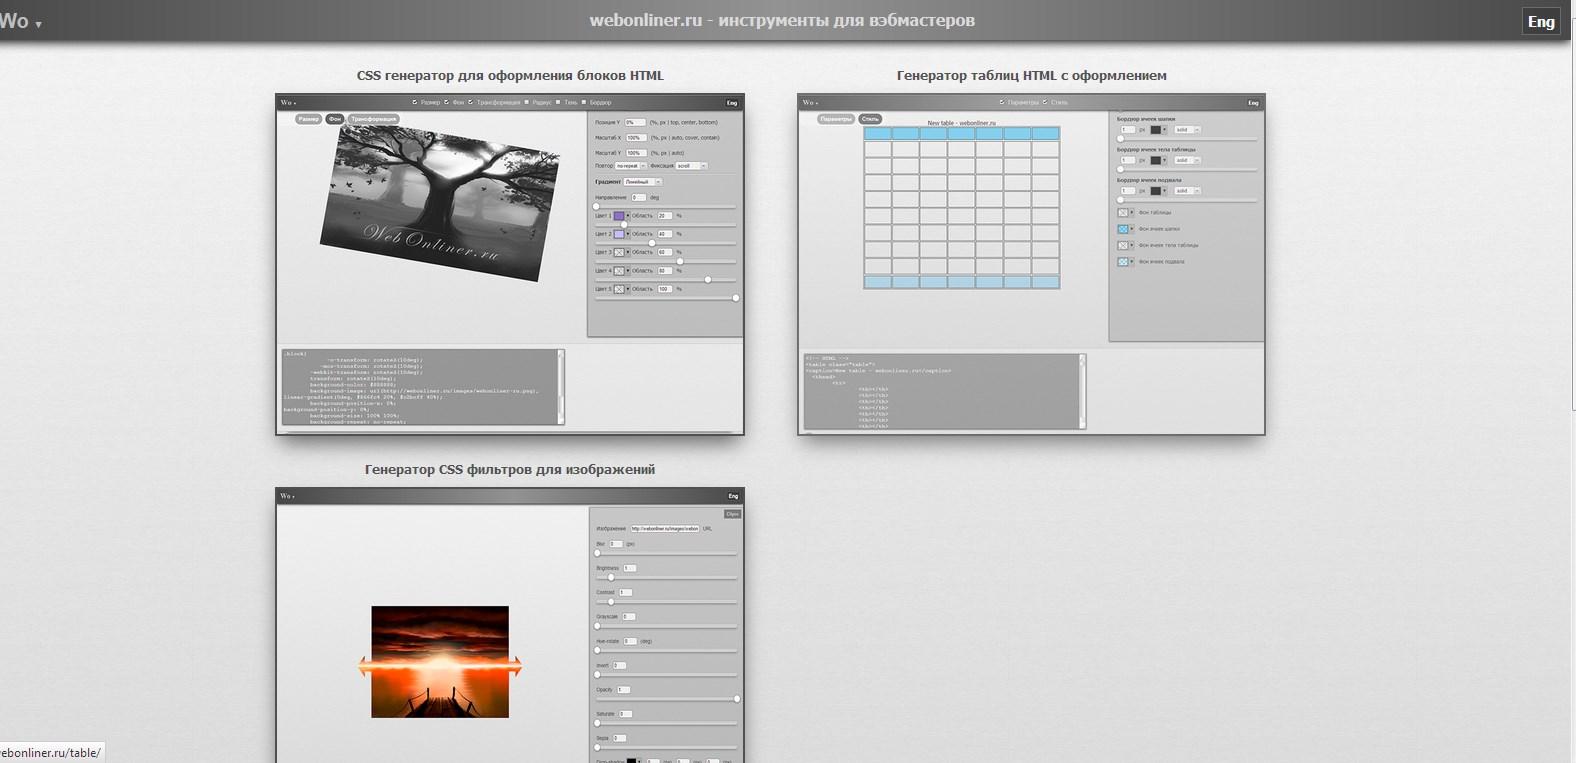 Онлайн-сервис для создания таблиц